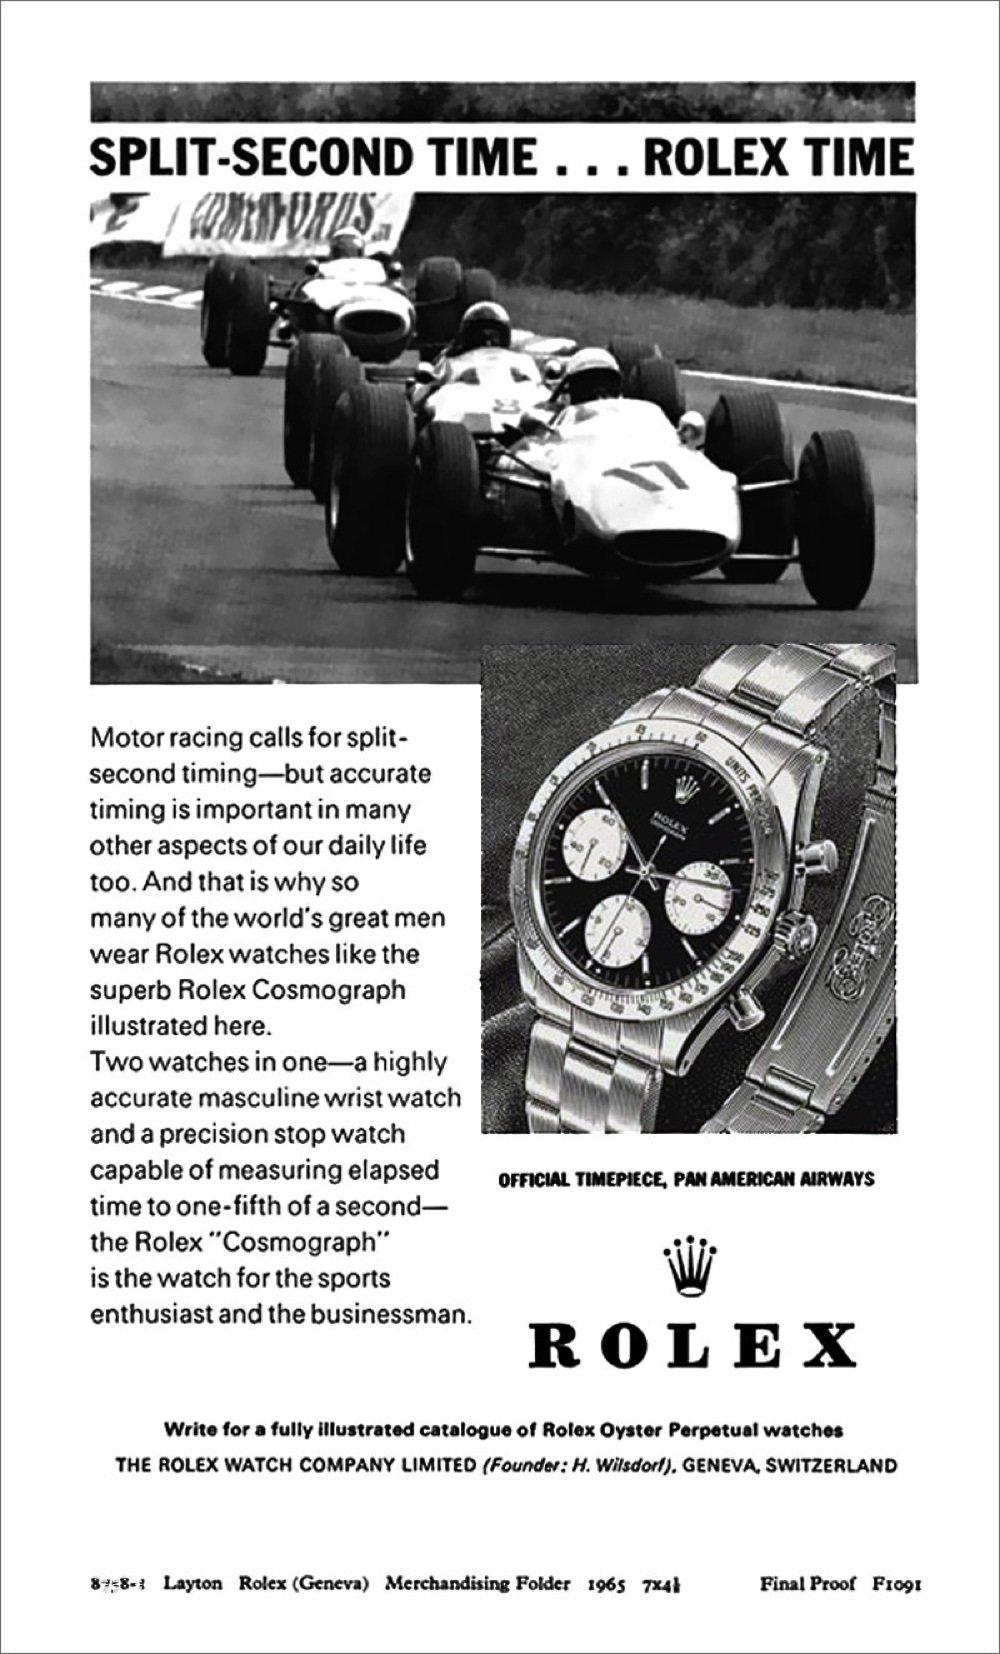 RPR_1965-Rolex-Cosmograph-ad